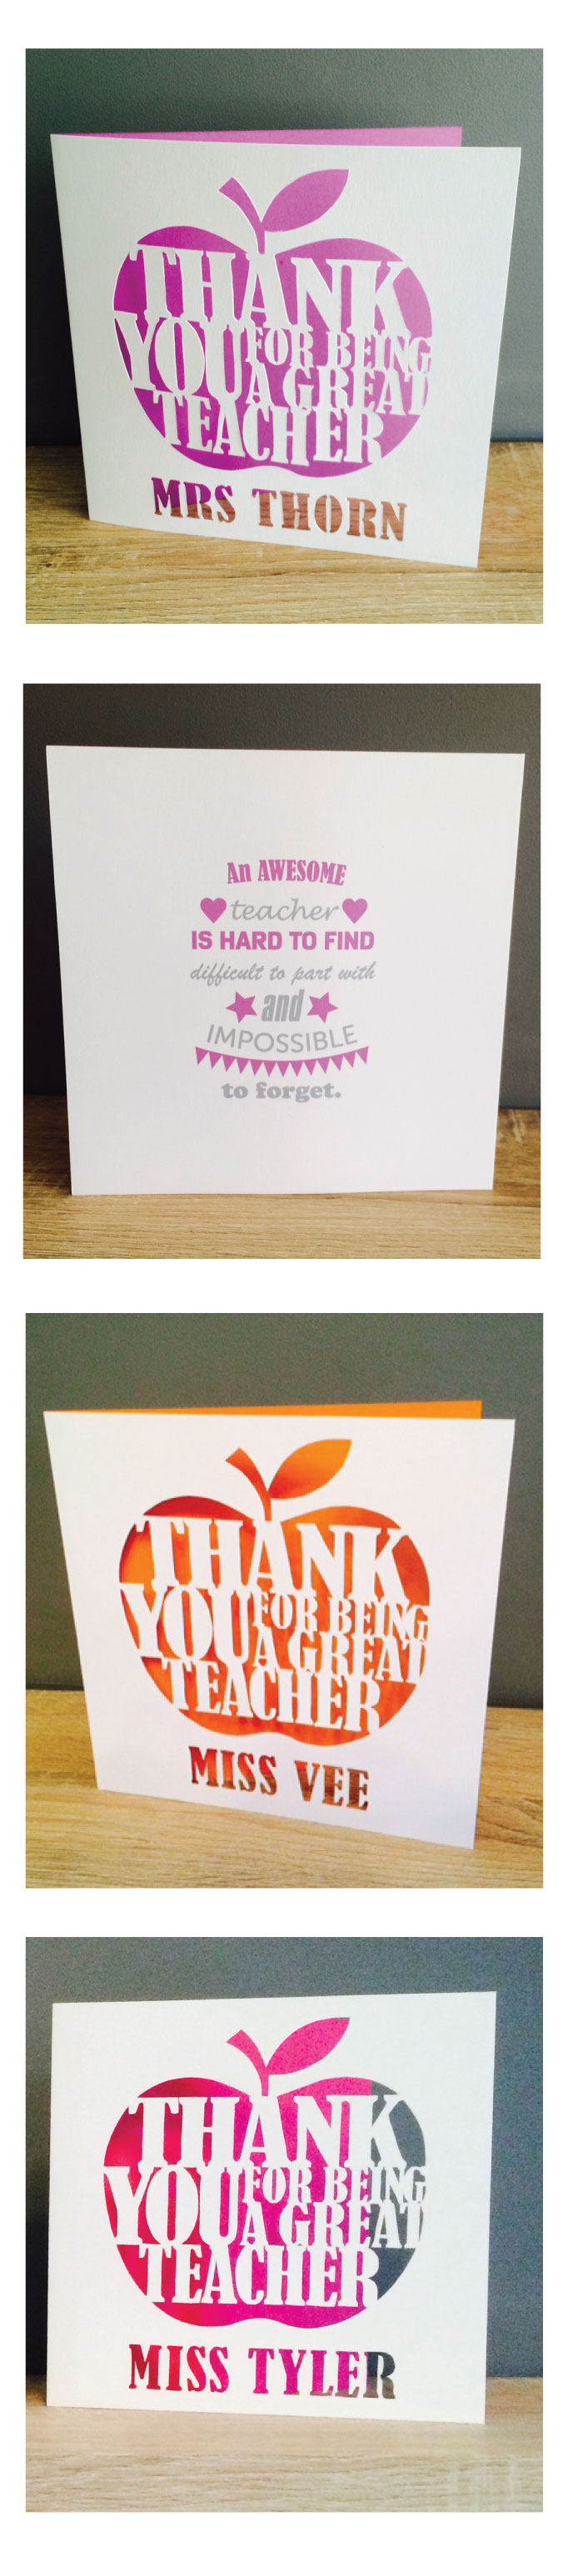 custom paper cutout thank you teacher card  paper cutout